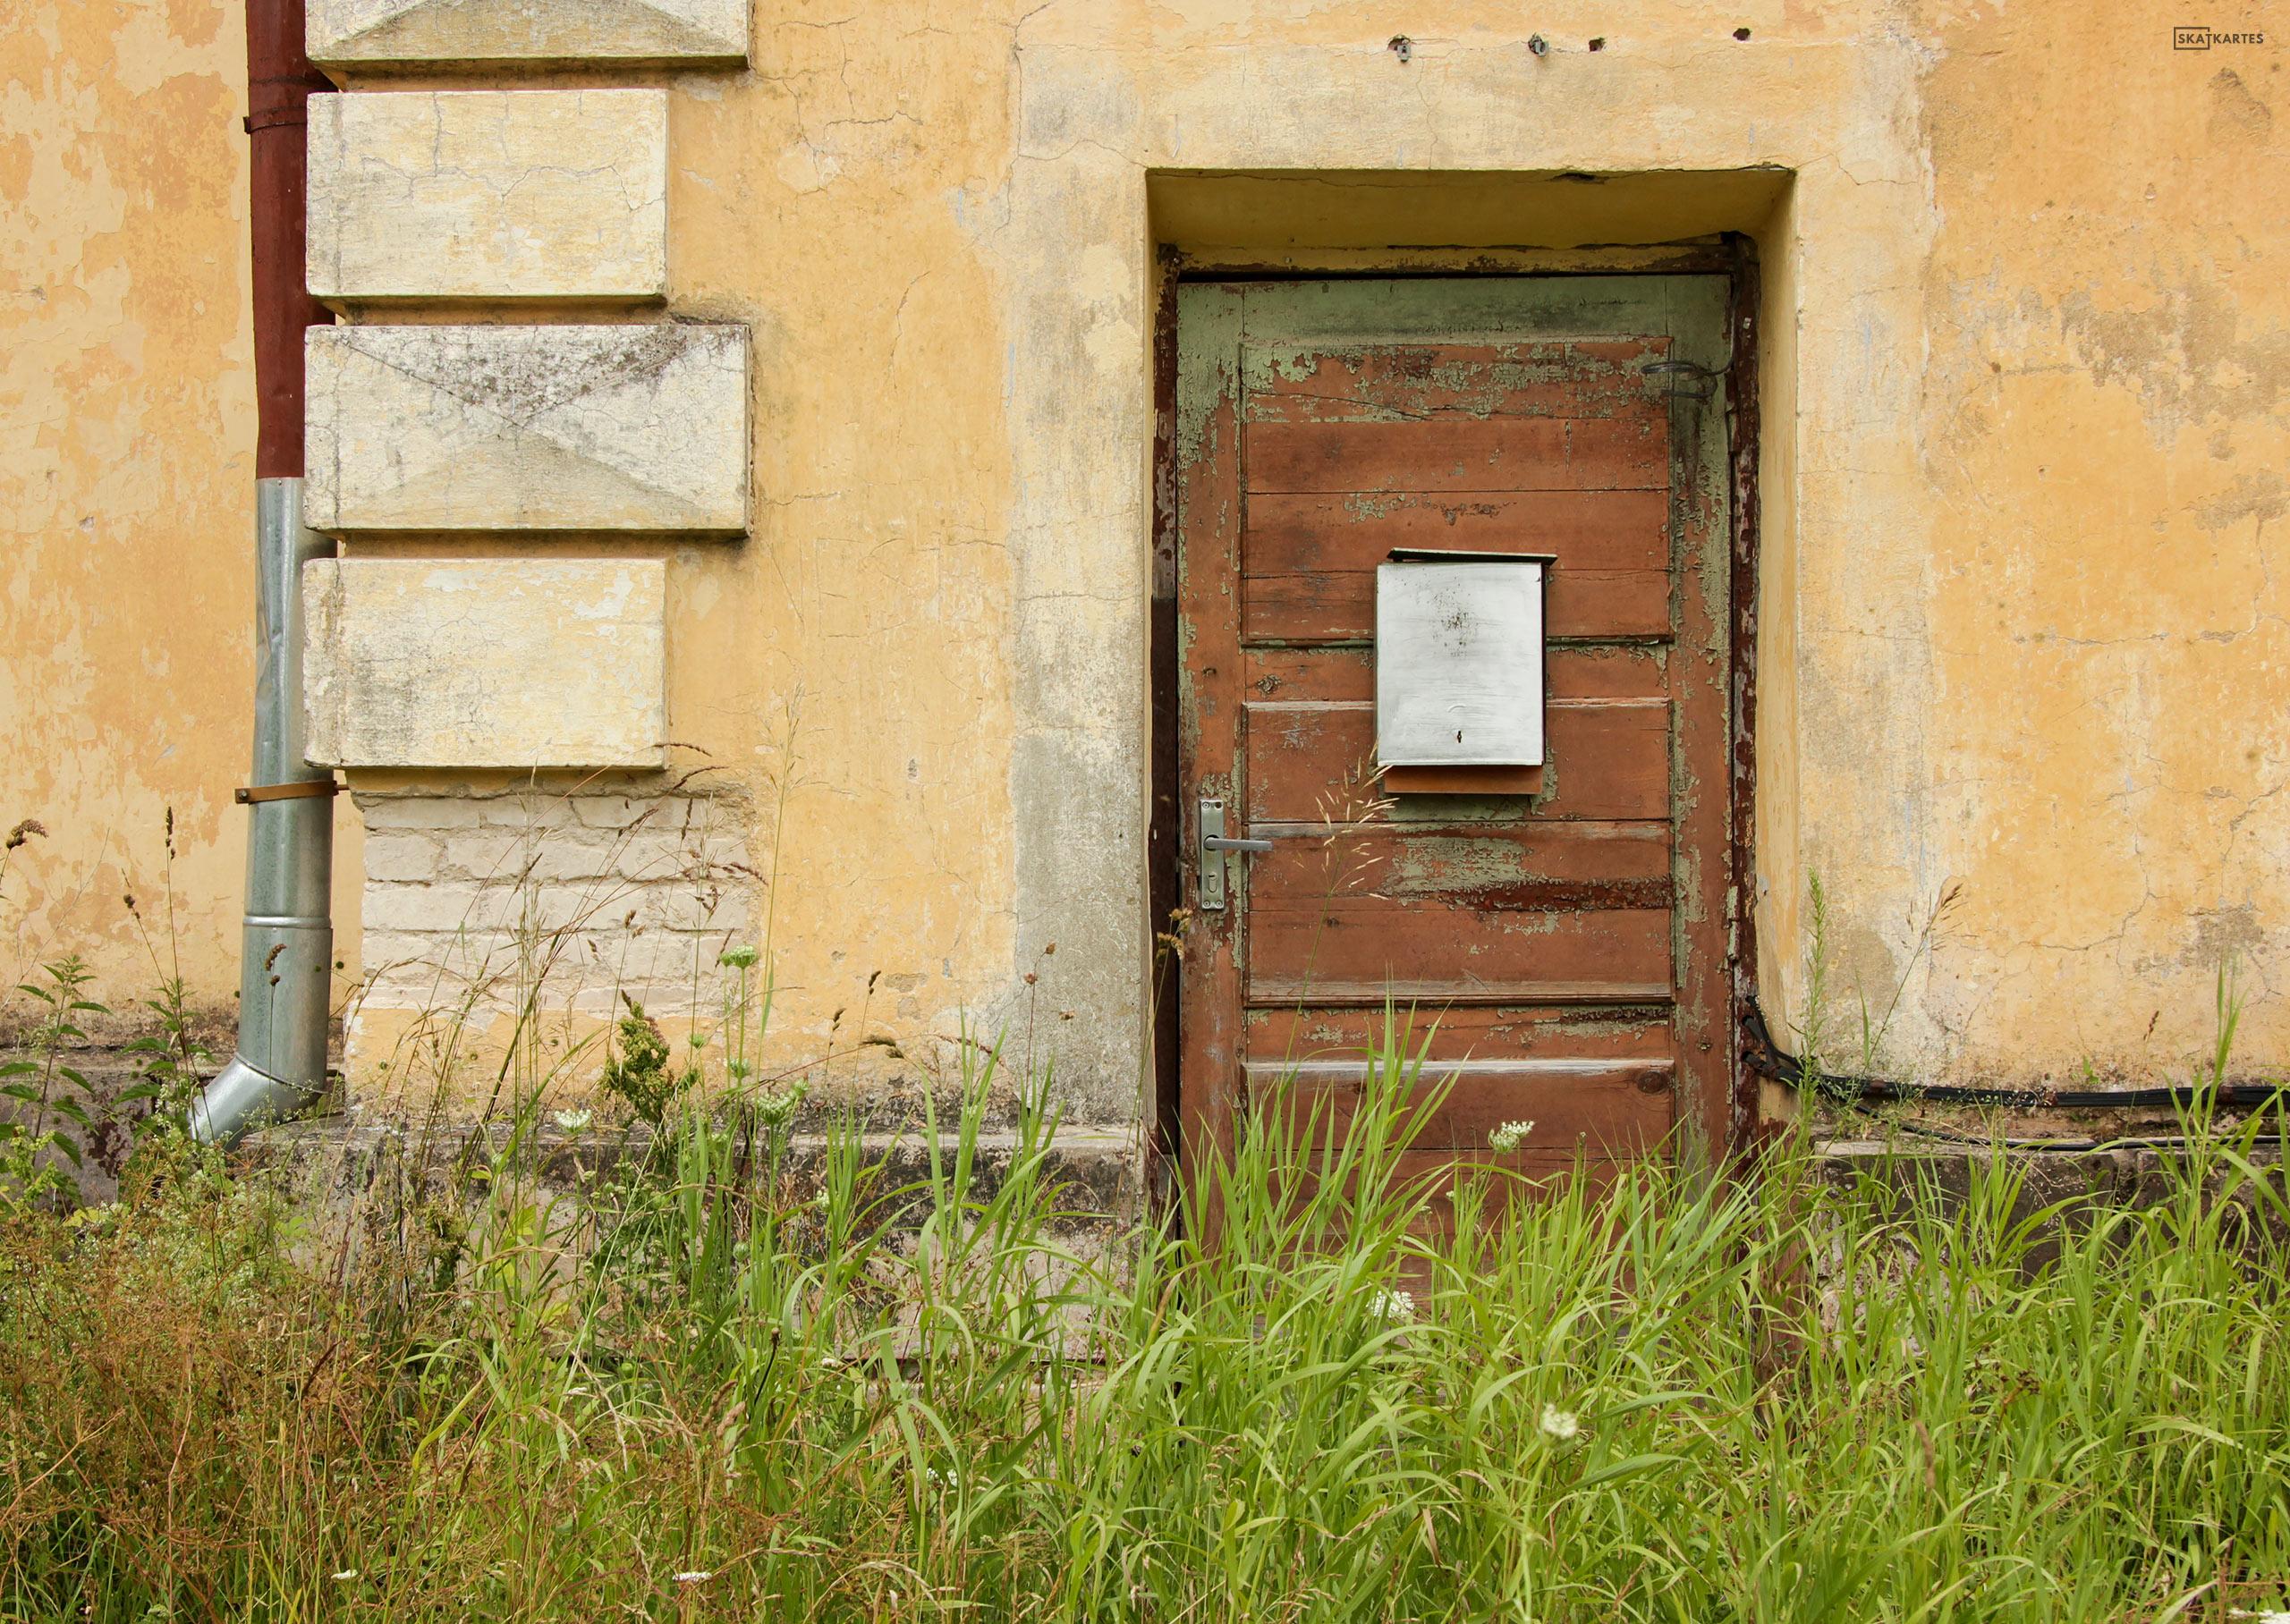 1049-1---Skatkartes-Latvija-Rigas-regions-Ogres-novads-Suntazi-2015